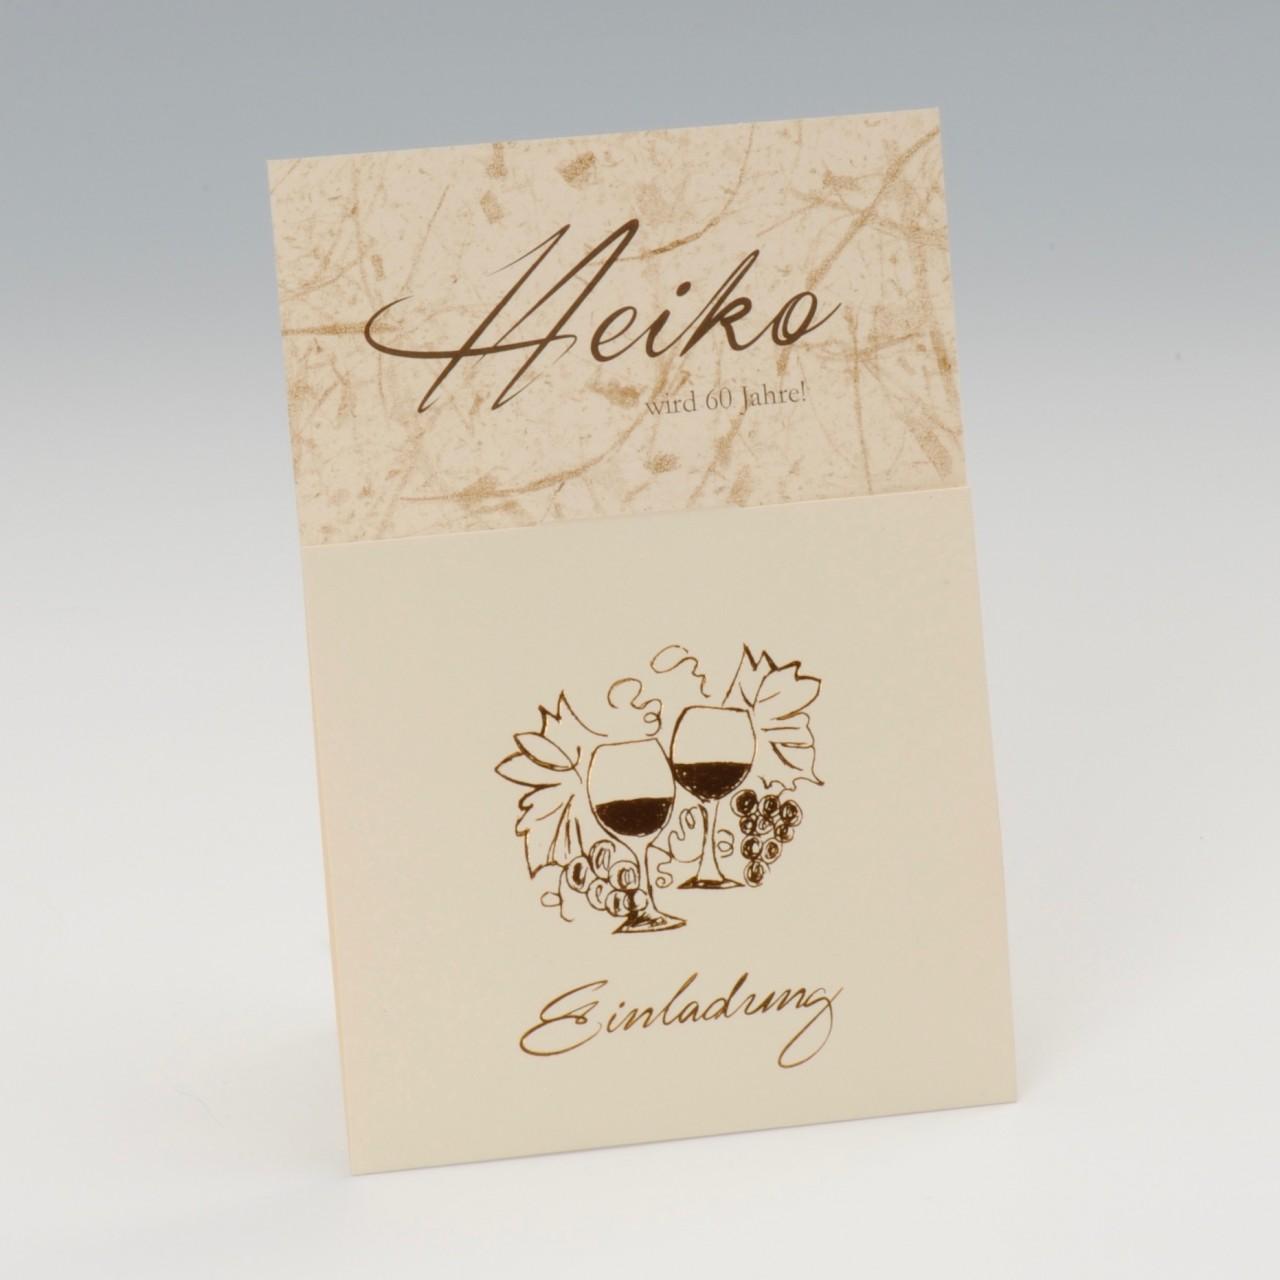 Einladungskarte - A 2090